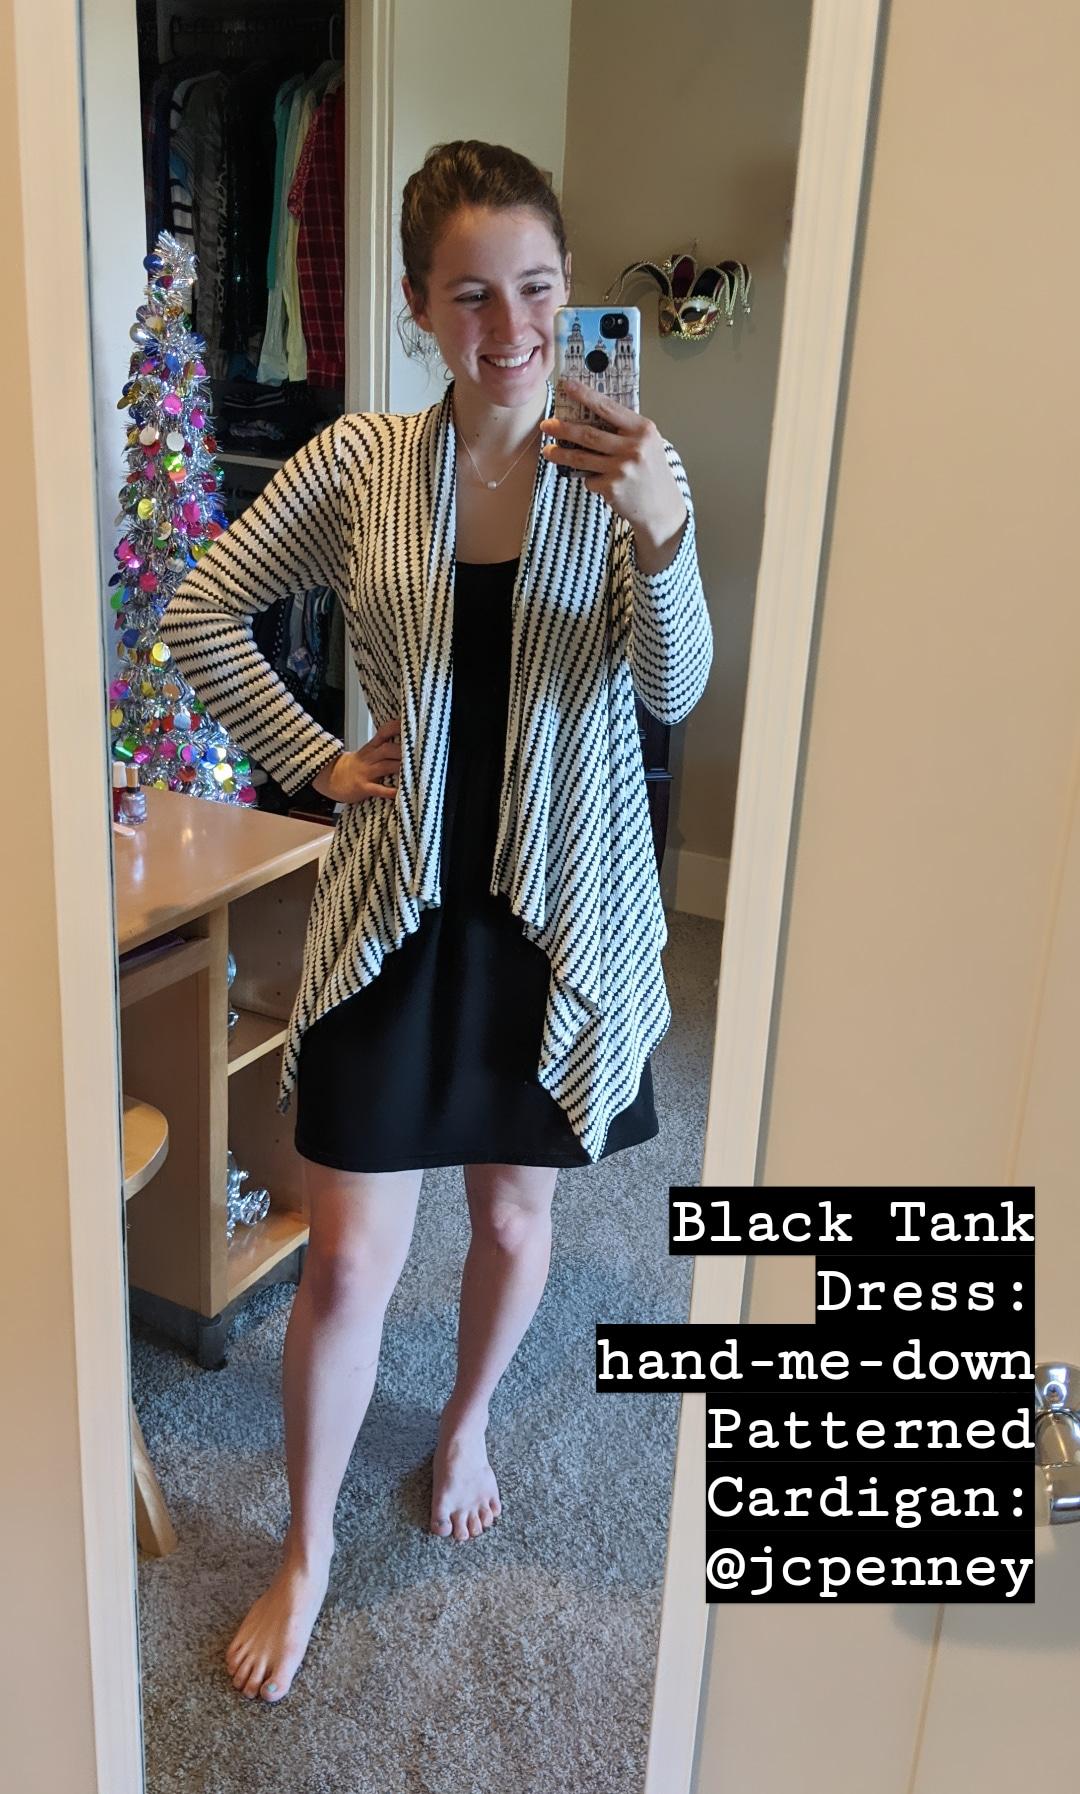 swing cardigan, black and white checkered, black tank dress, hand-me-downs